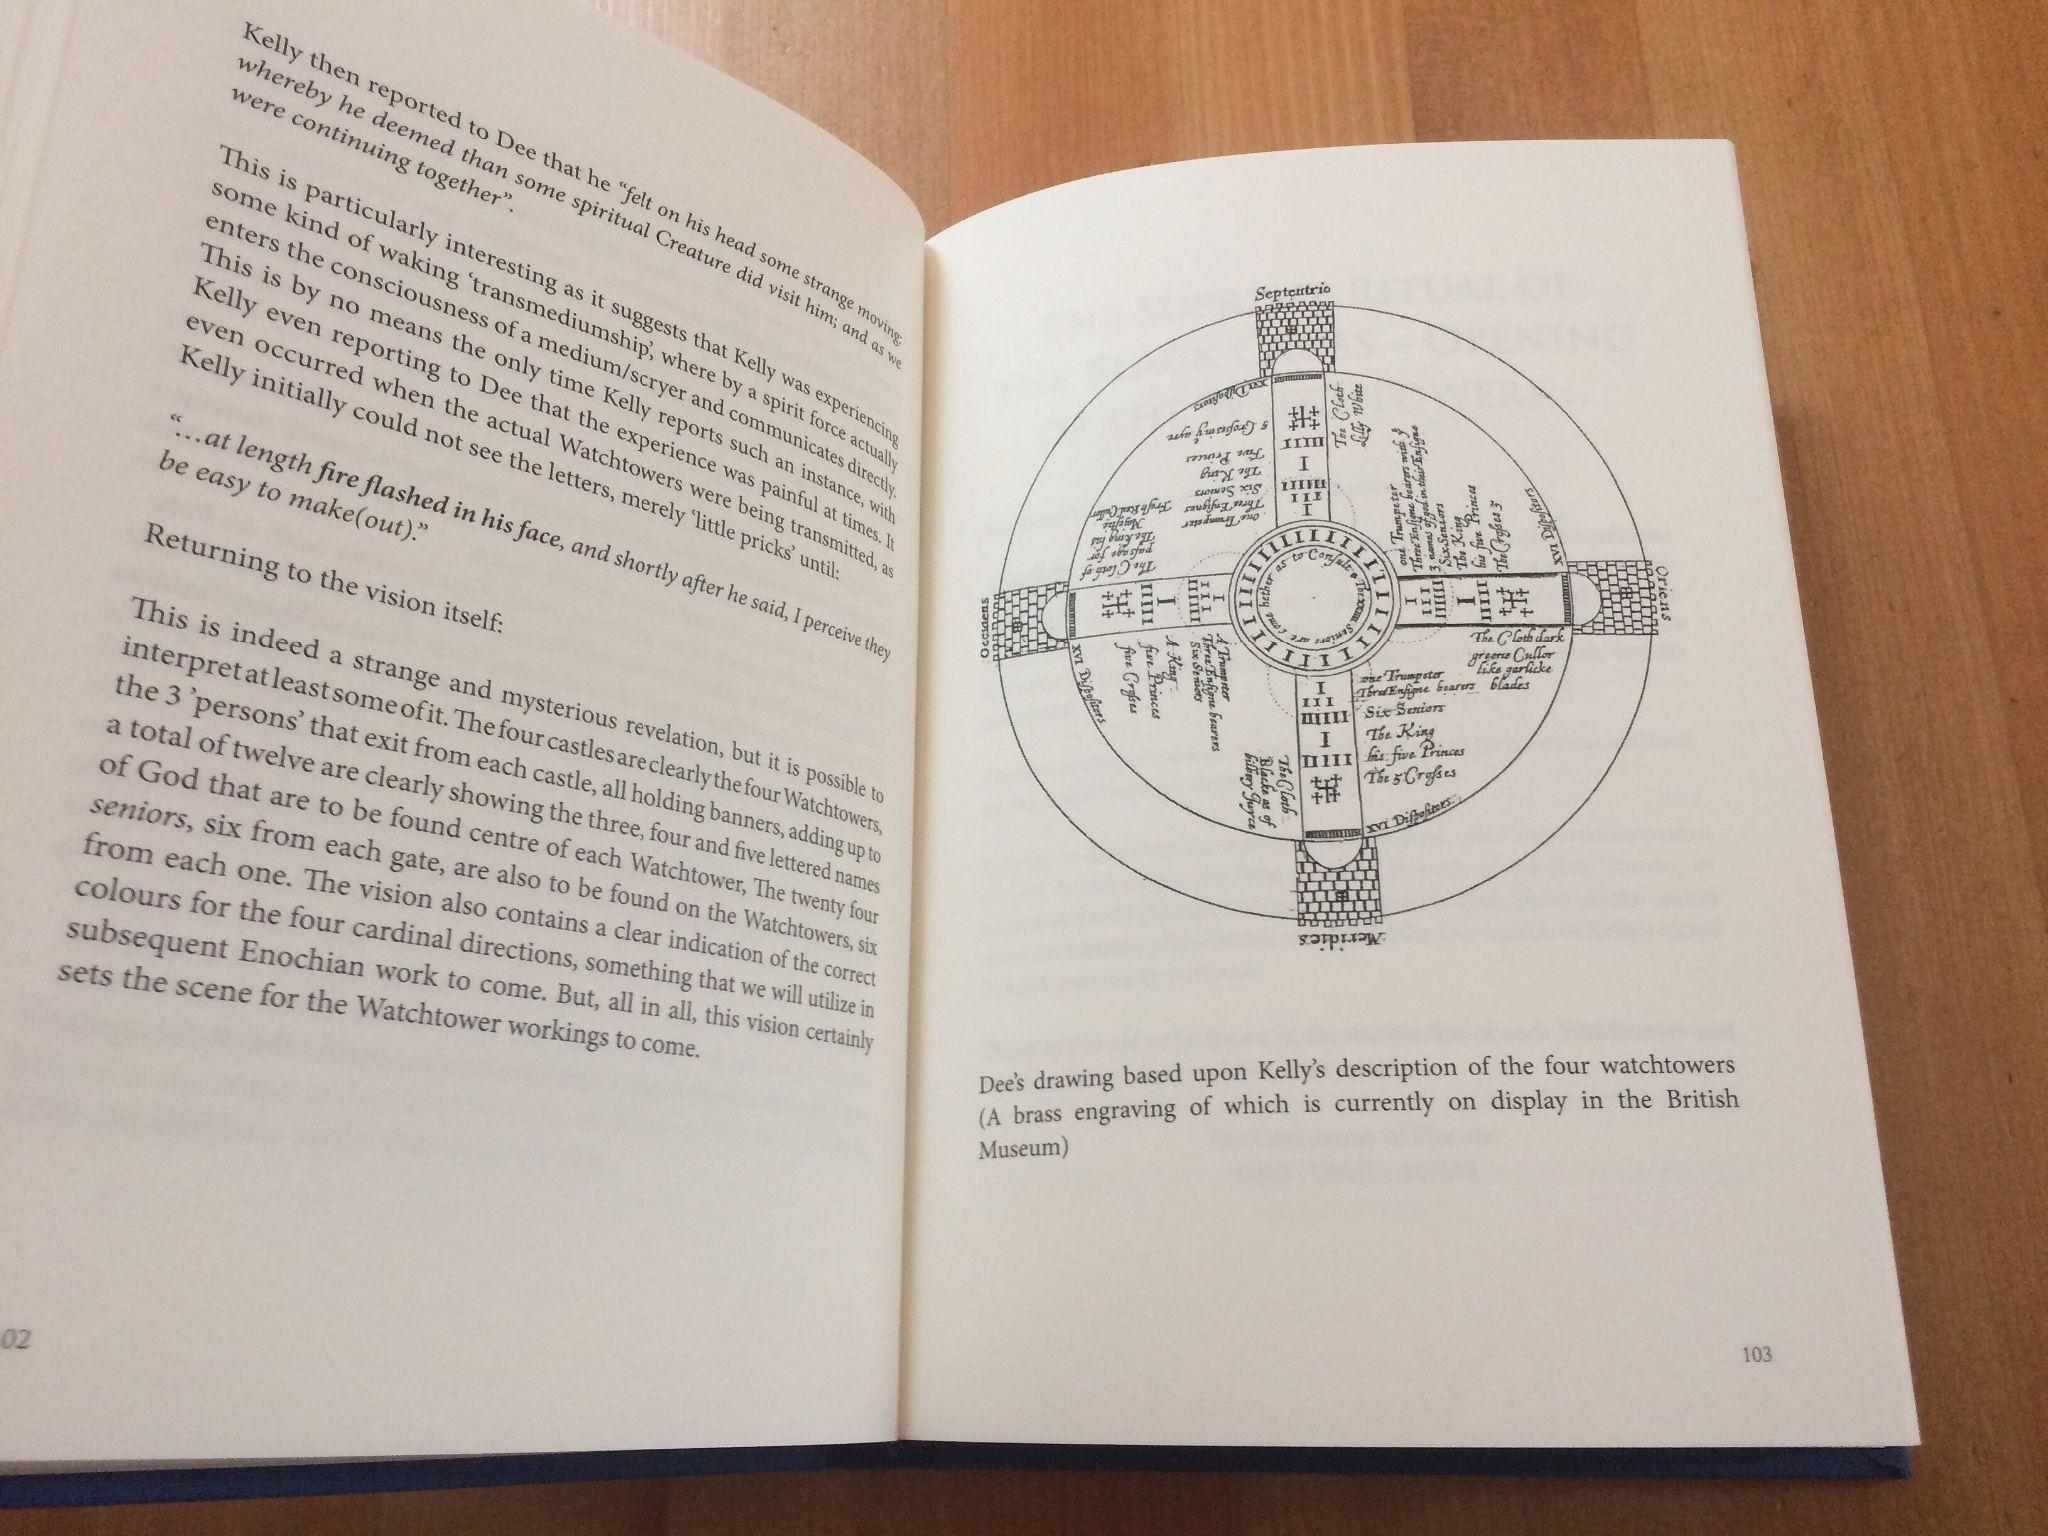 Liber Coronzom - An Enochian Grimoire DELUXE edition